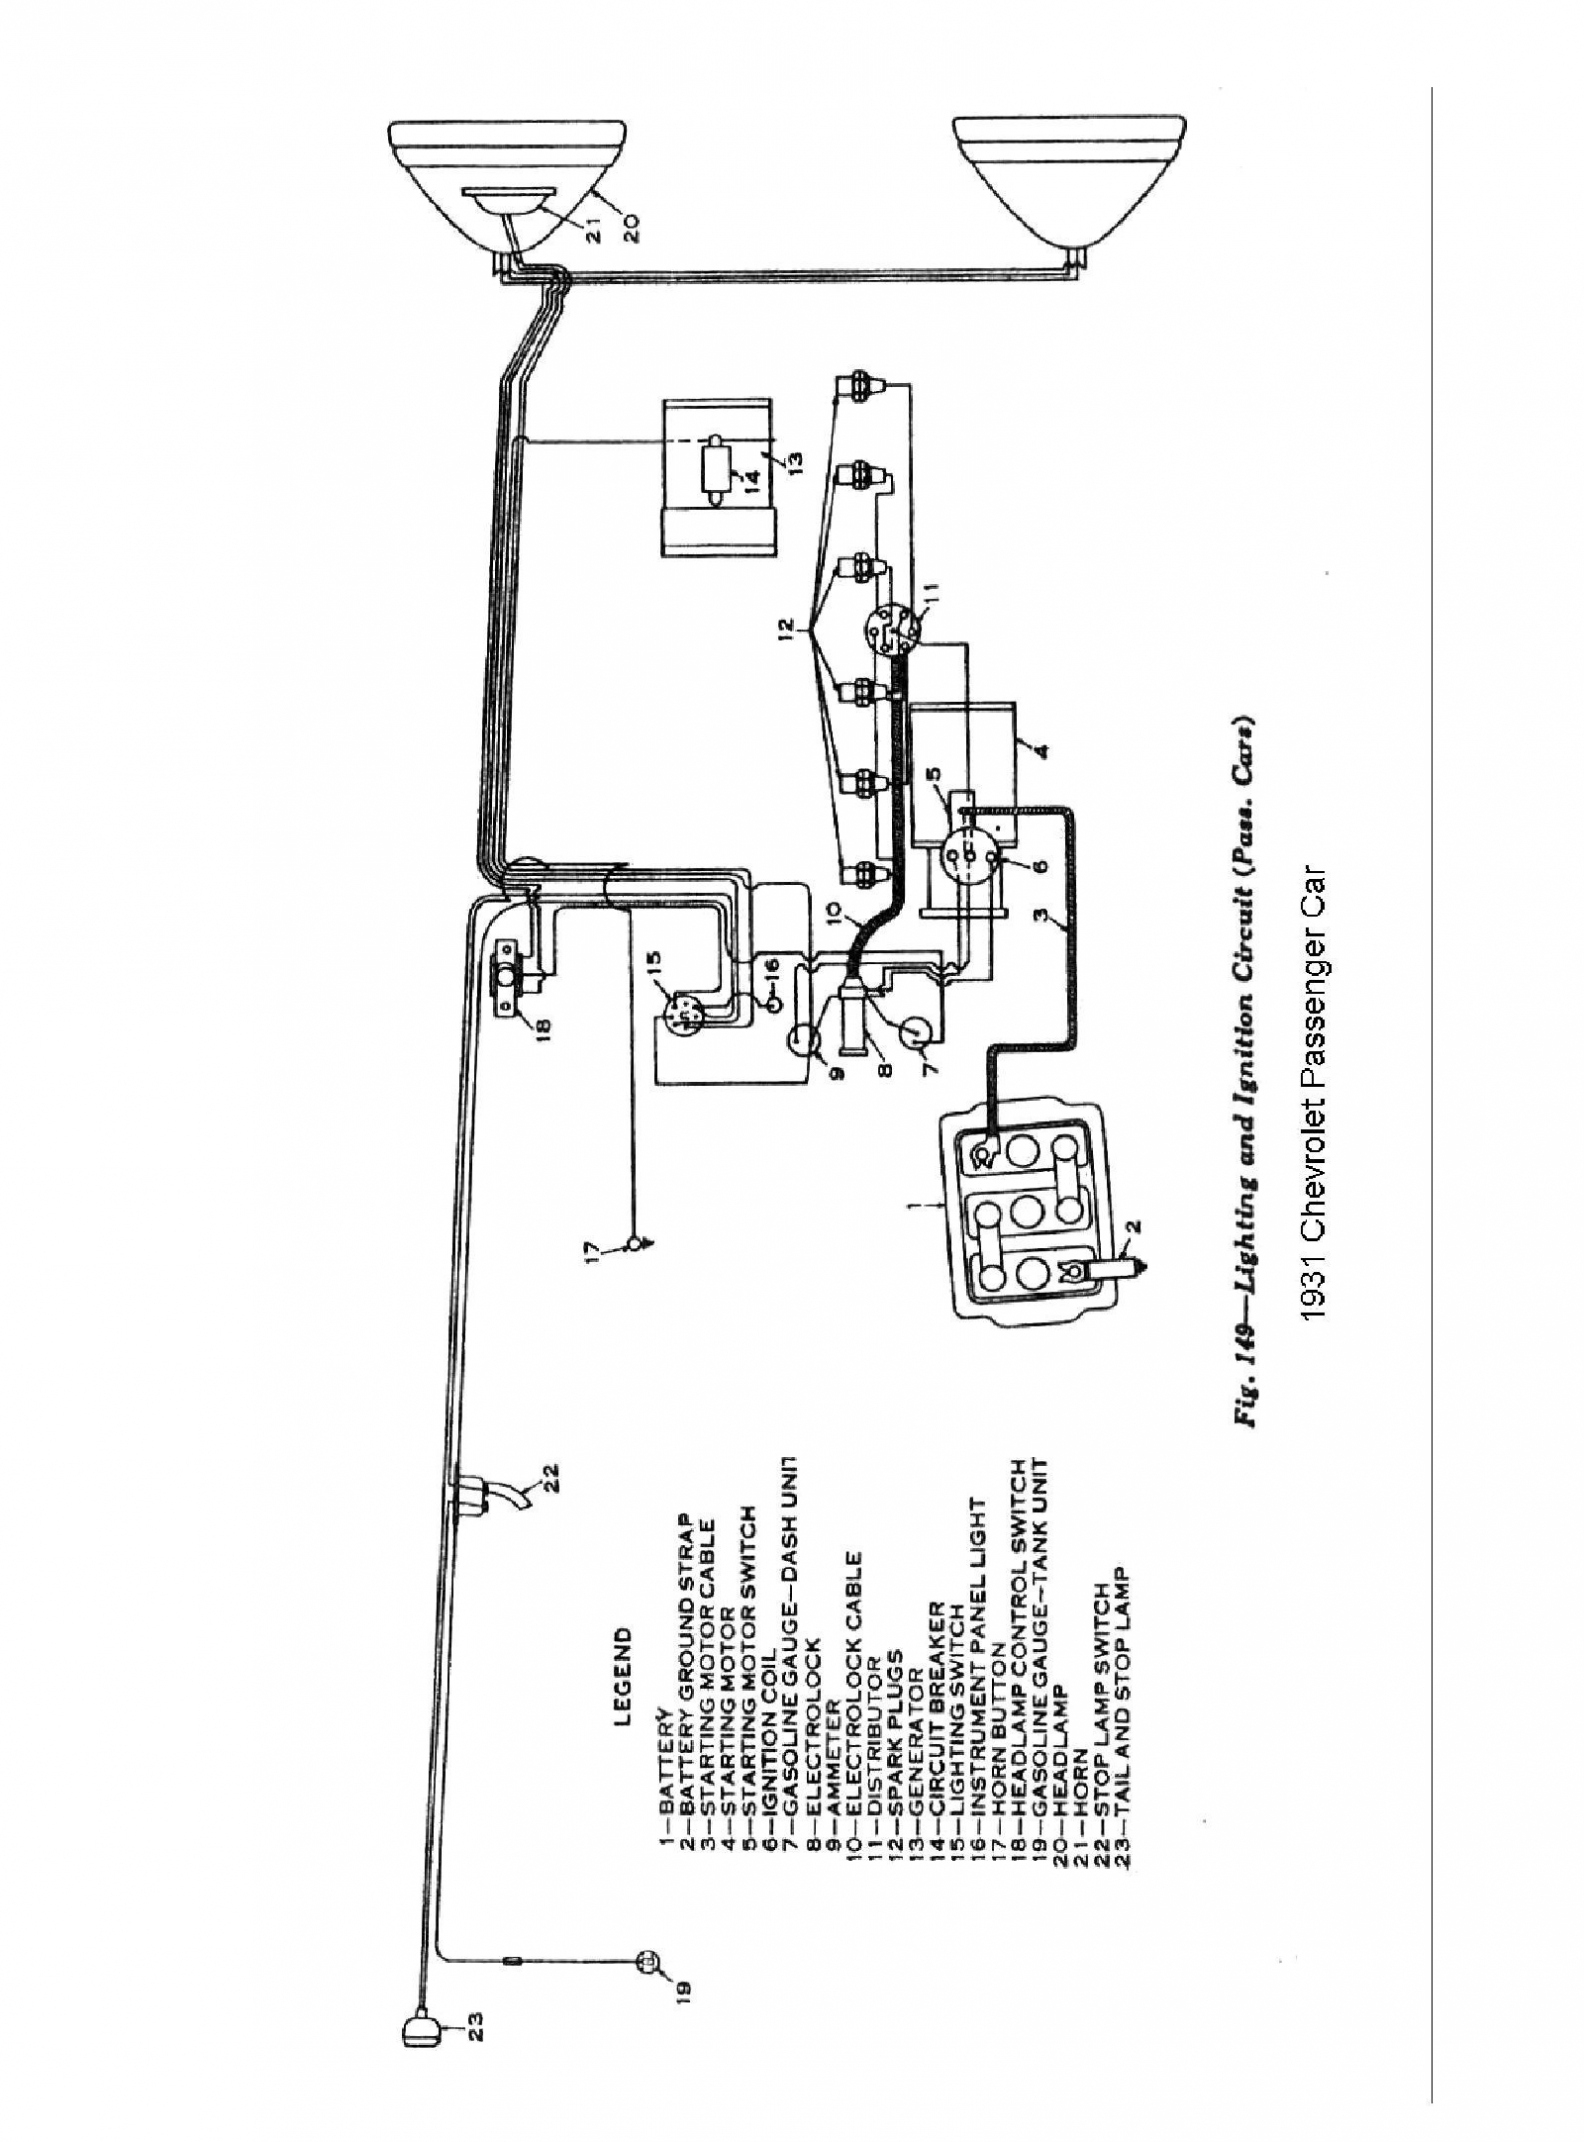 Control Box Wiring Diagram Onan Marquis Generator on genset wiring-diagram, rzt cub cadet wiring-diagram, cub cadet 1045 wiring-diagram, cub cadet 108 wiring-diagram, cub cadet 1450 wiring-diagram, cub cadet 129 wiring-diagram, cub cadet lt1050 wiring-diagram, cub cadet 1440 wiring-diagram, cub cadet lt1045 wiring-diagram, cub cadet 2135 wiring-diagram, cub cadet 2155 wiring-diagram, cub cadet 2166 wiring-diagram, cub cadet 126 wiring-diagram, cummins celect wiring-diagram, 16 hp vanguard wiring-diagram, cub cadet 1650 wiring-diagram, cub cadet 1641 wiring-diagram,